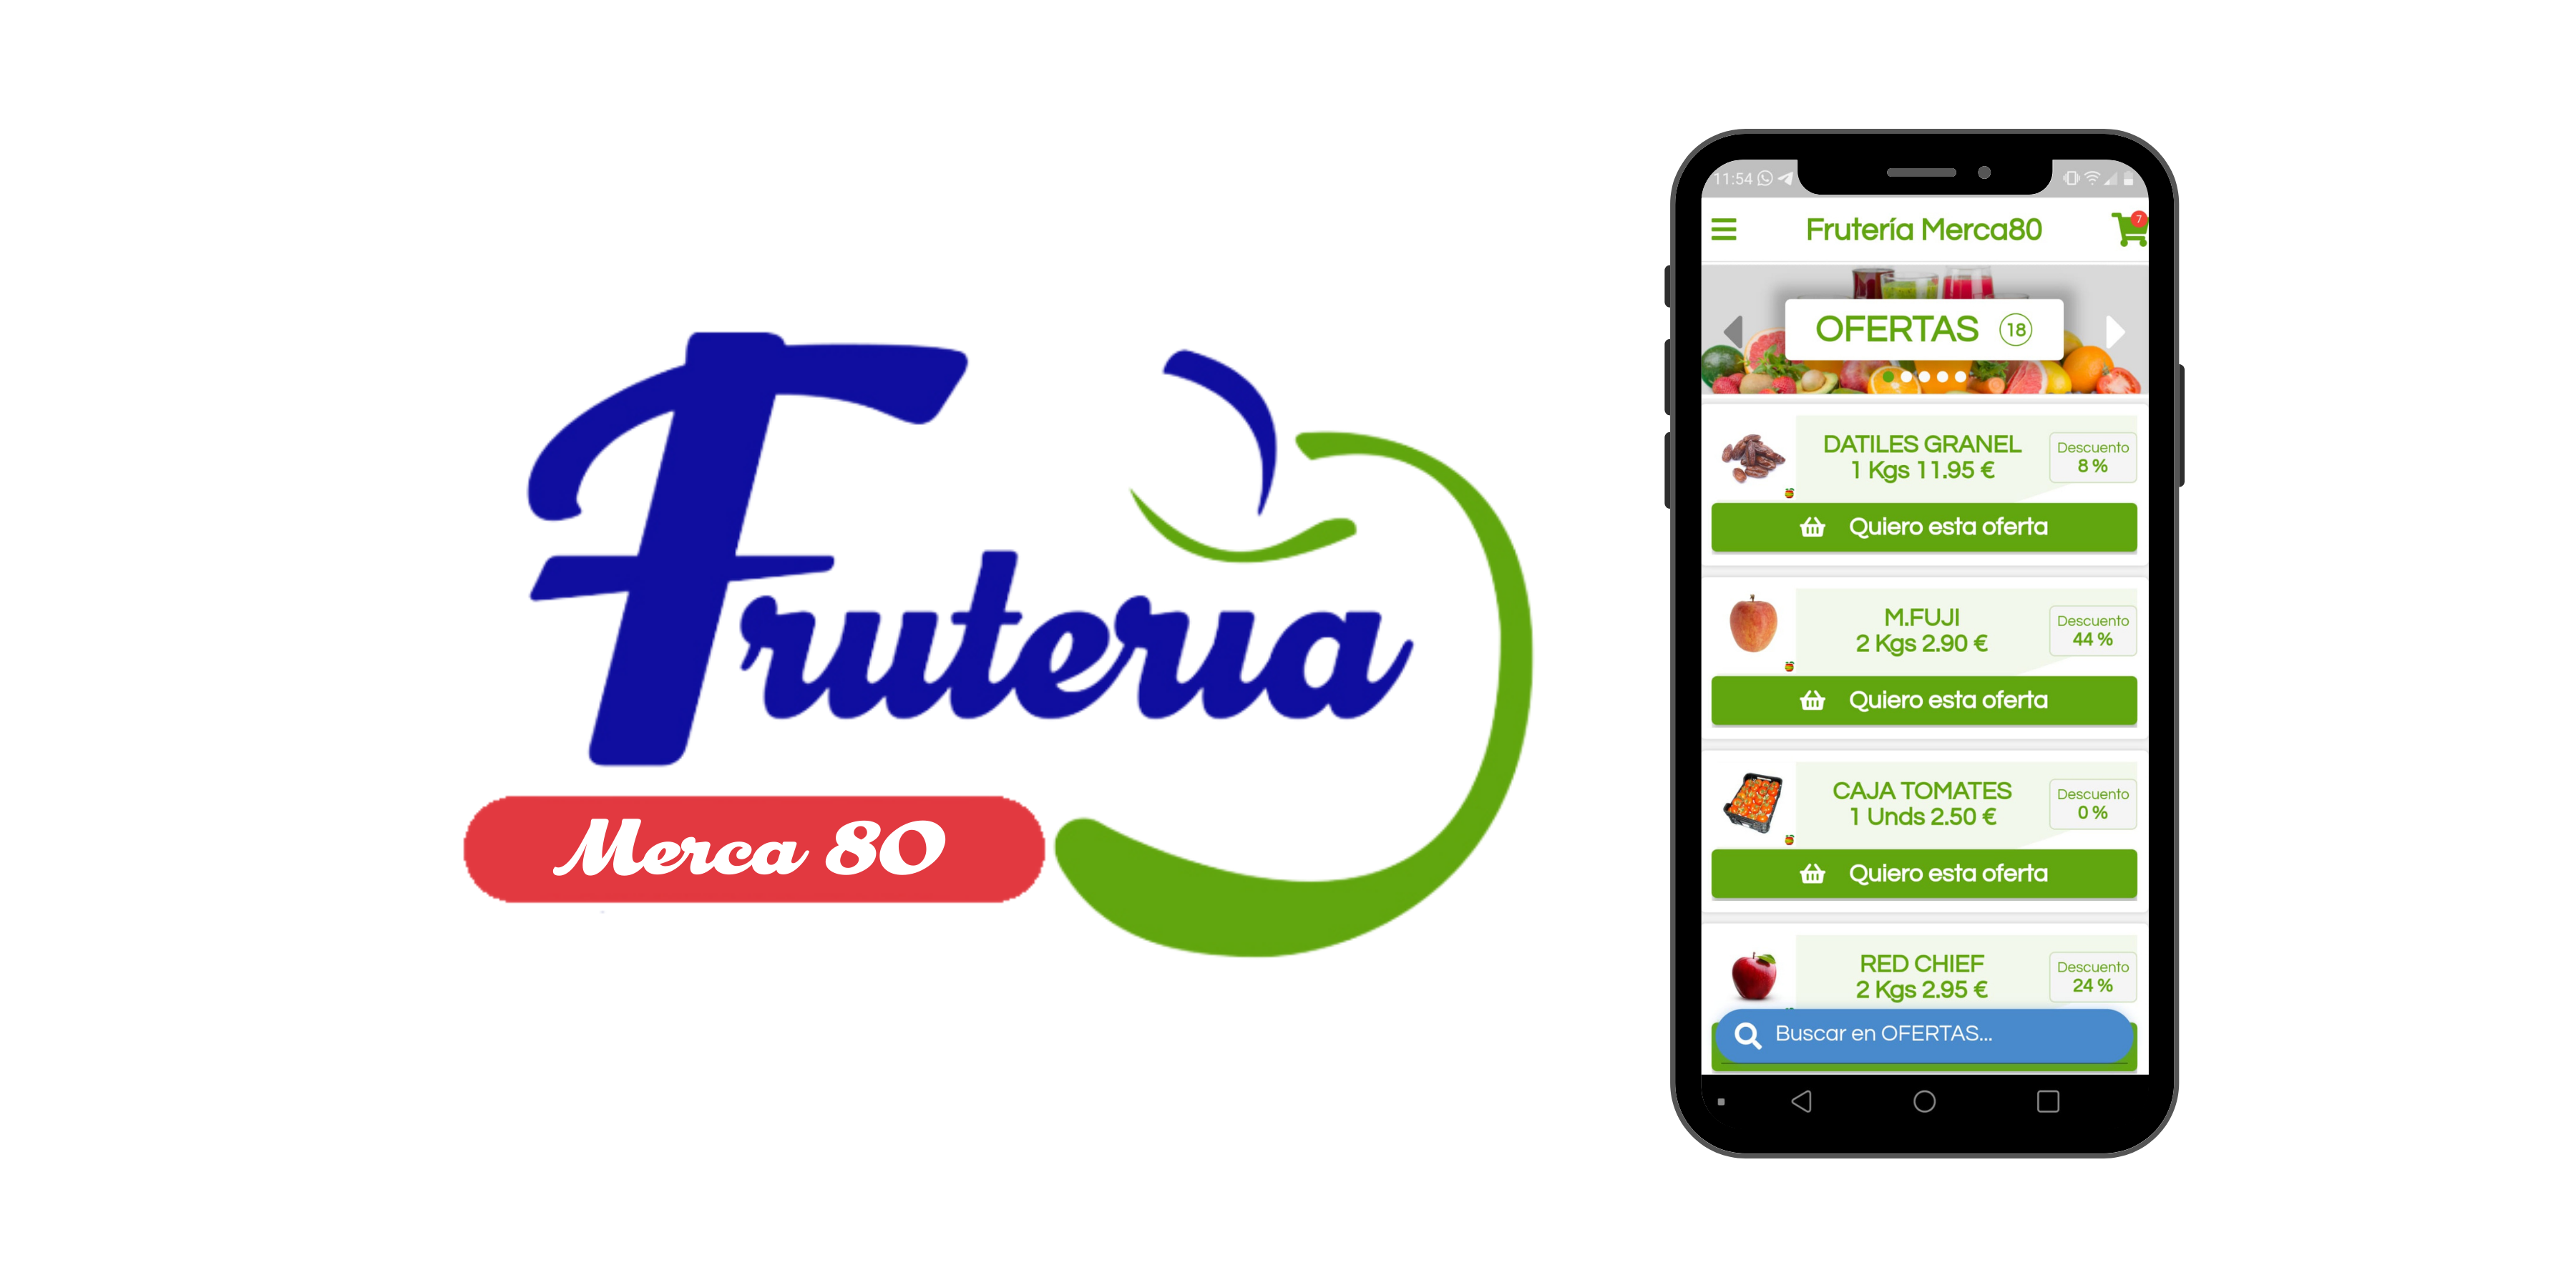 Fruteria Merca80